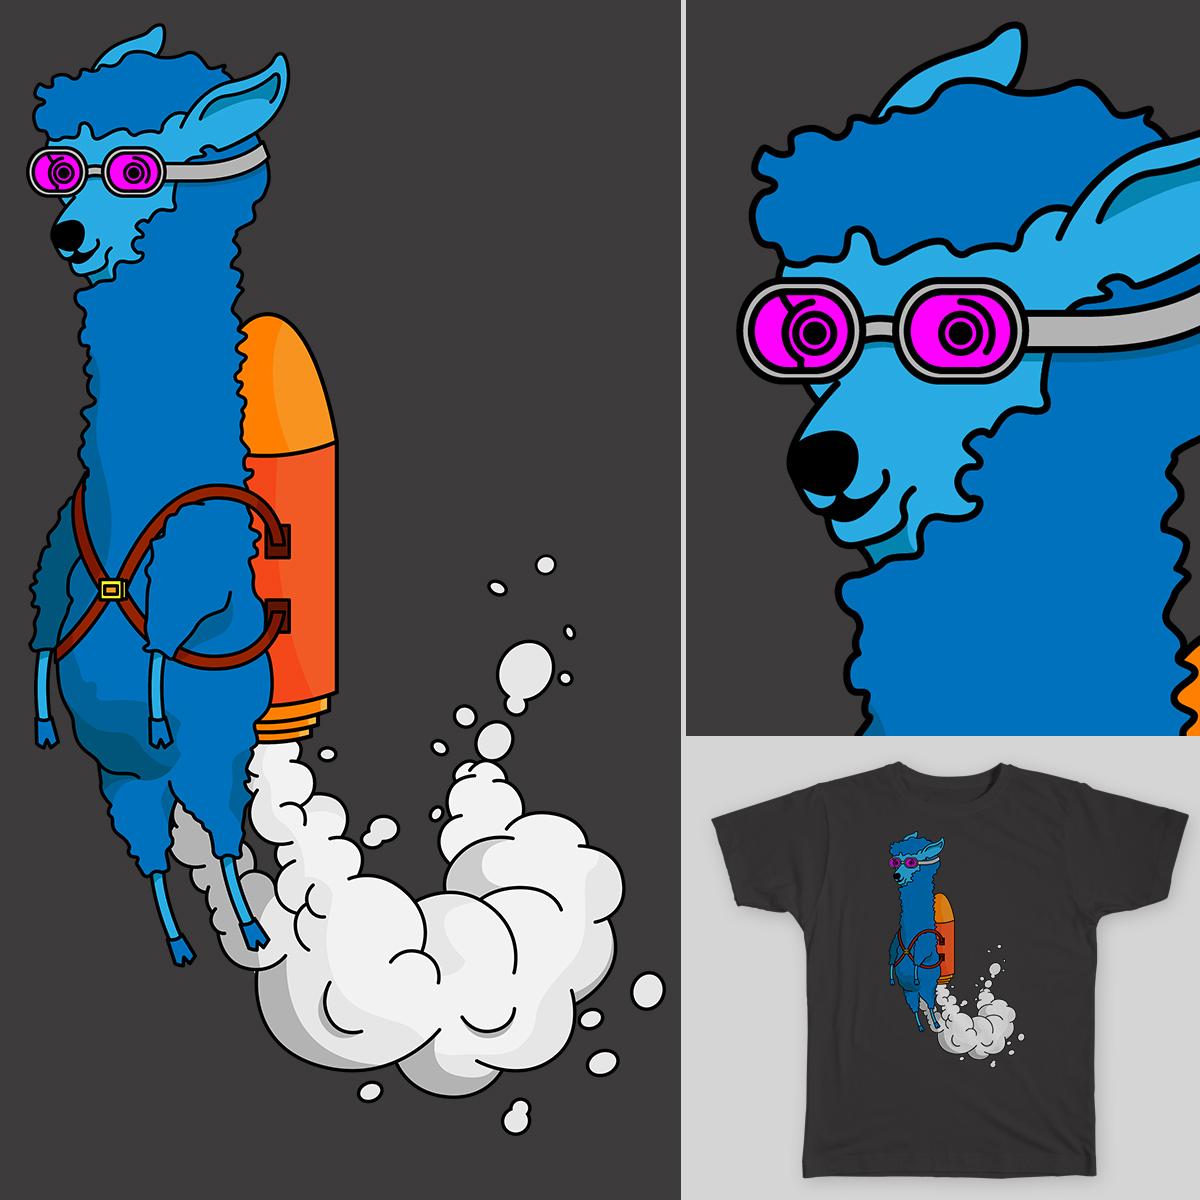 Rocket Llama by Jordan.gonzo on Threadless